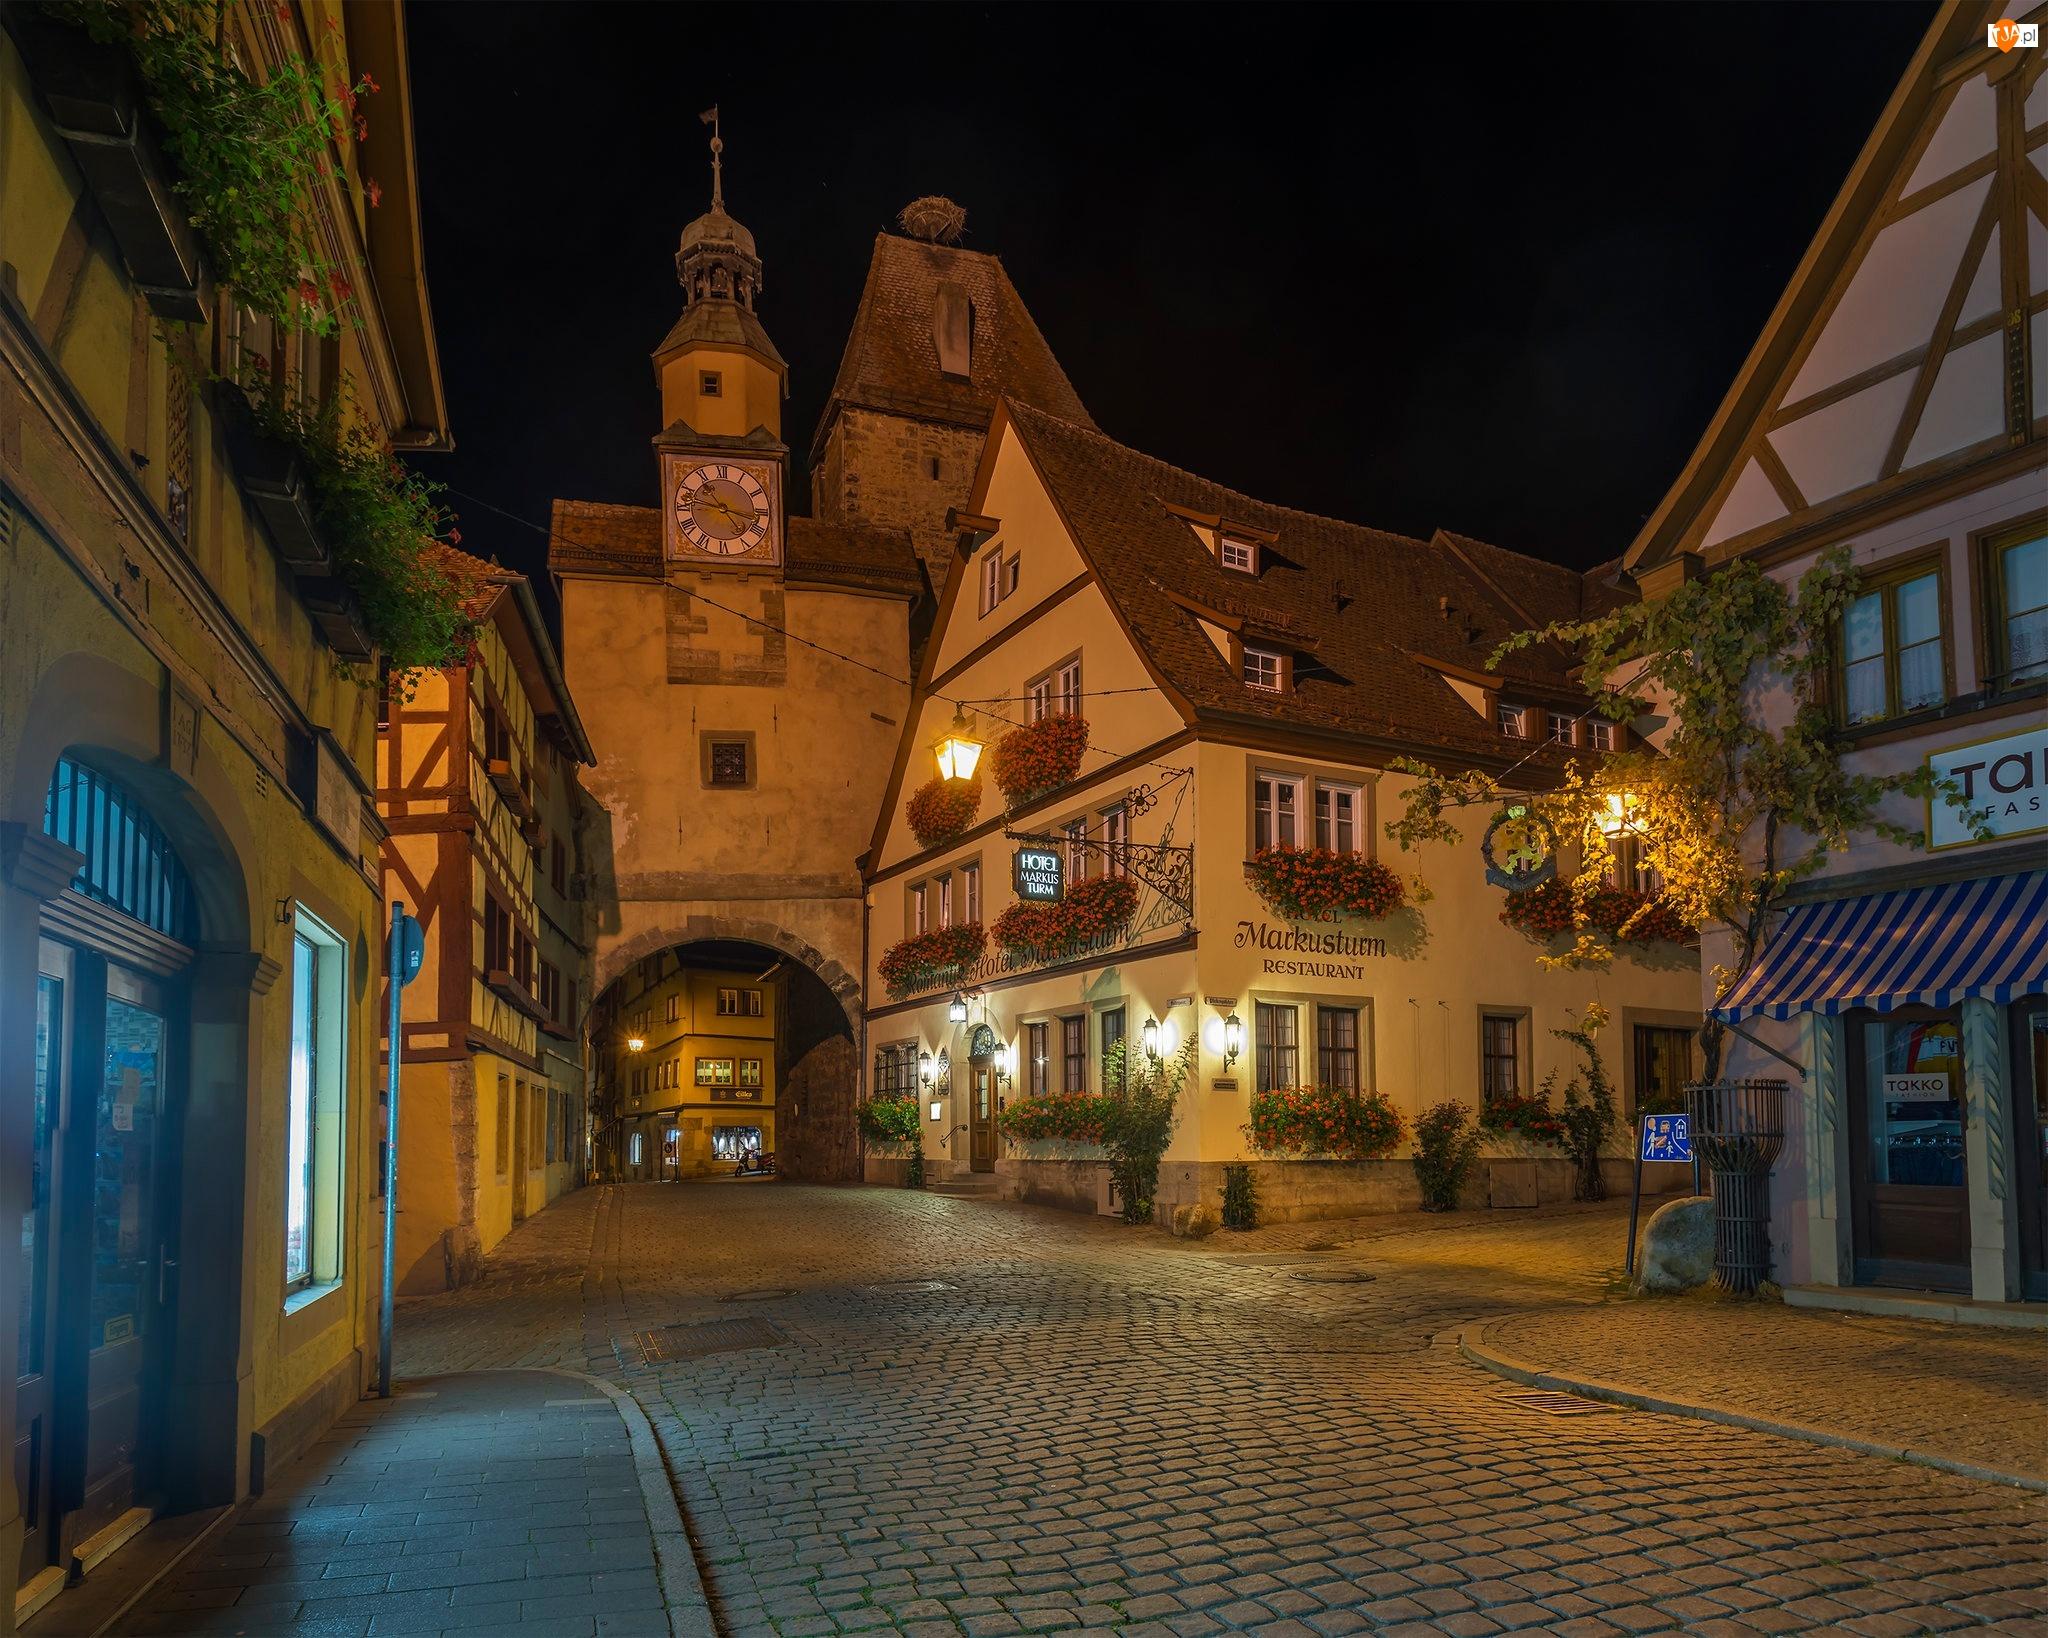 Latarnie, Miasto, Noc, Bawaria, Rothenburg ob der Tauber, Ulica, Niemcy, Domy